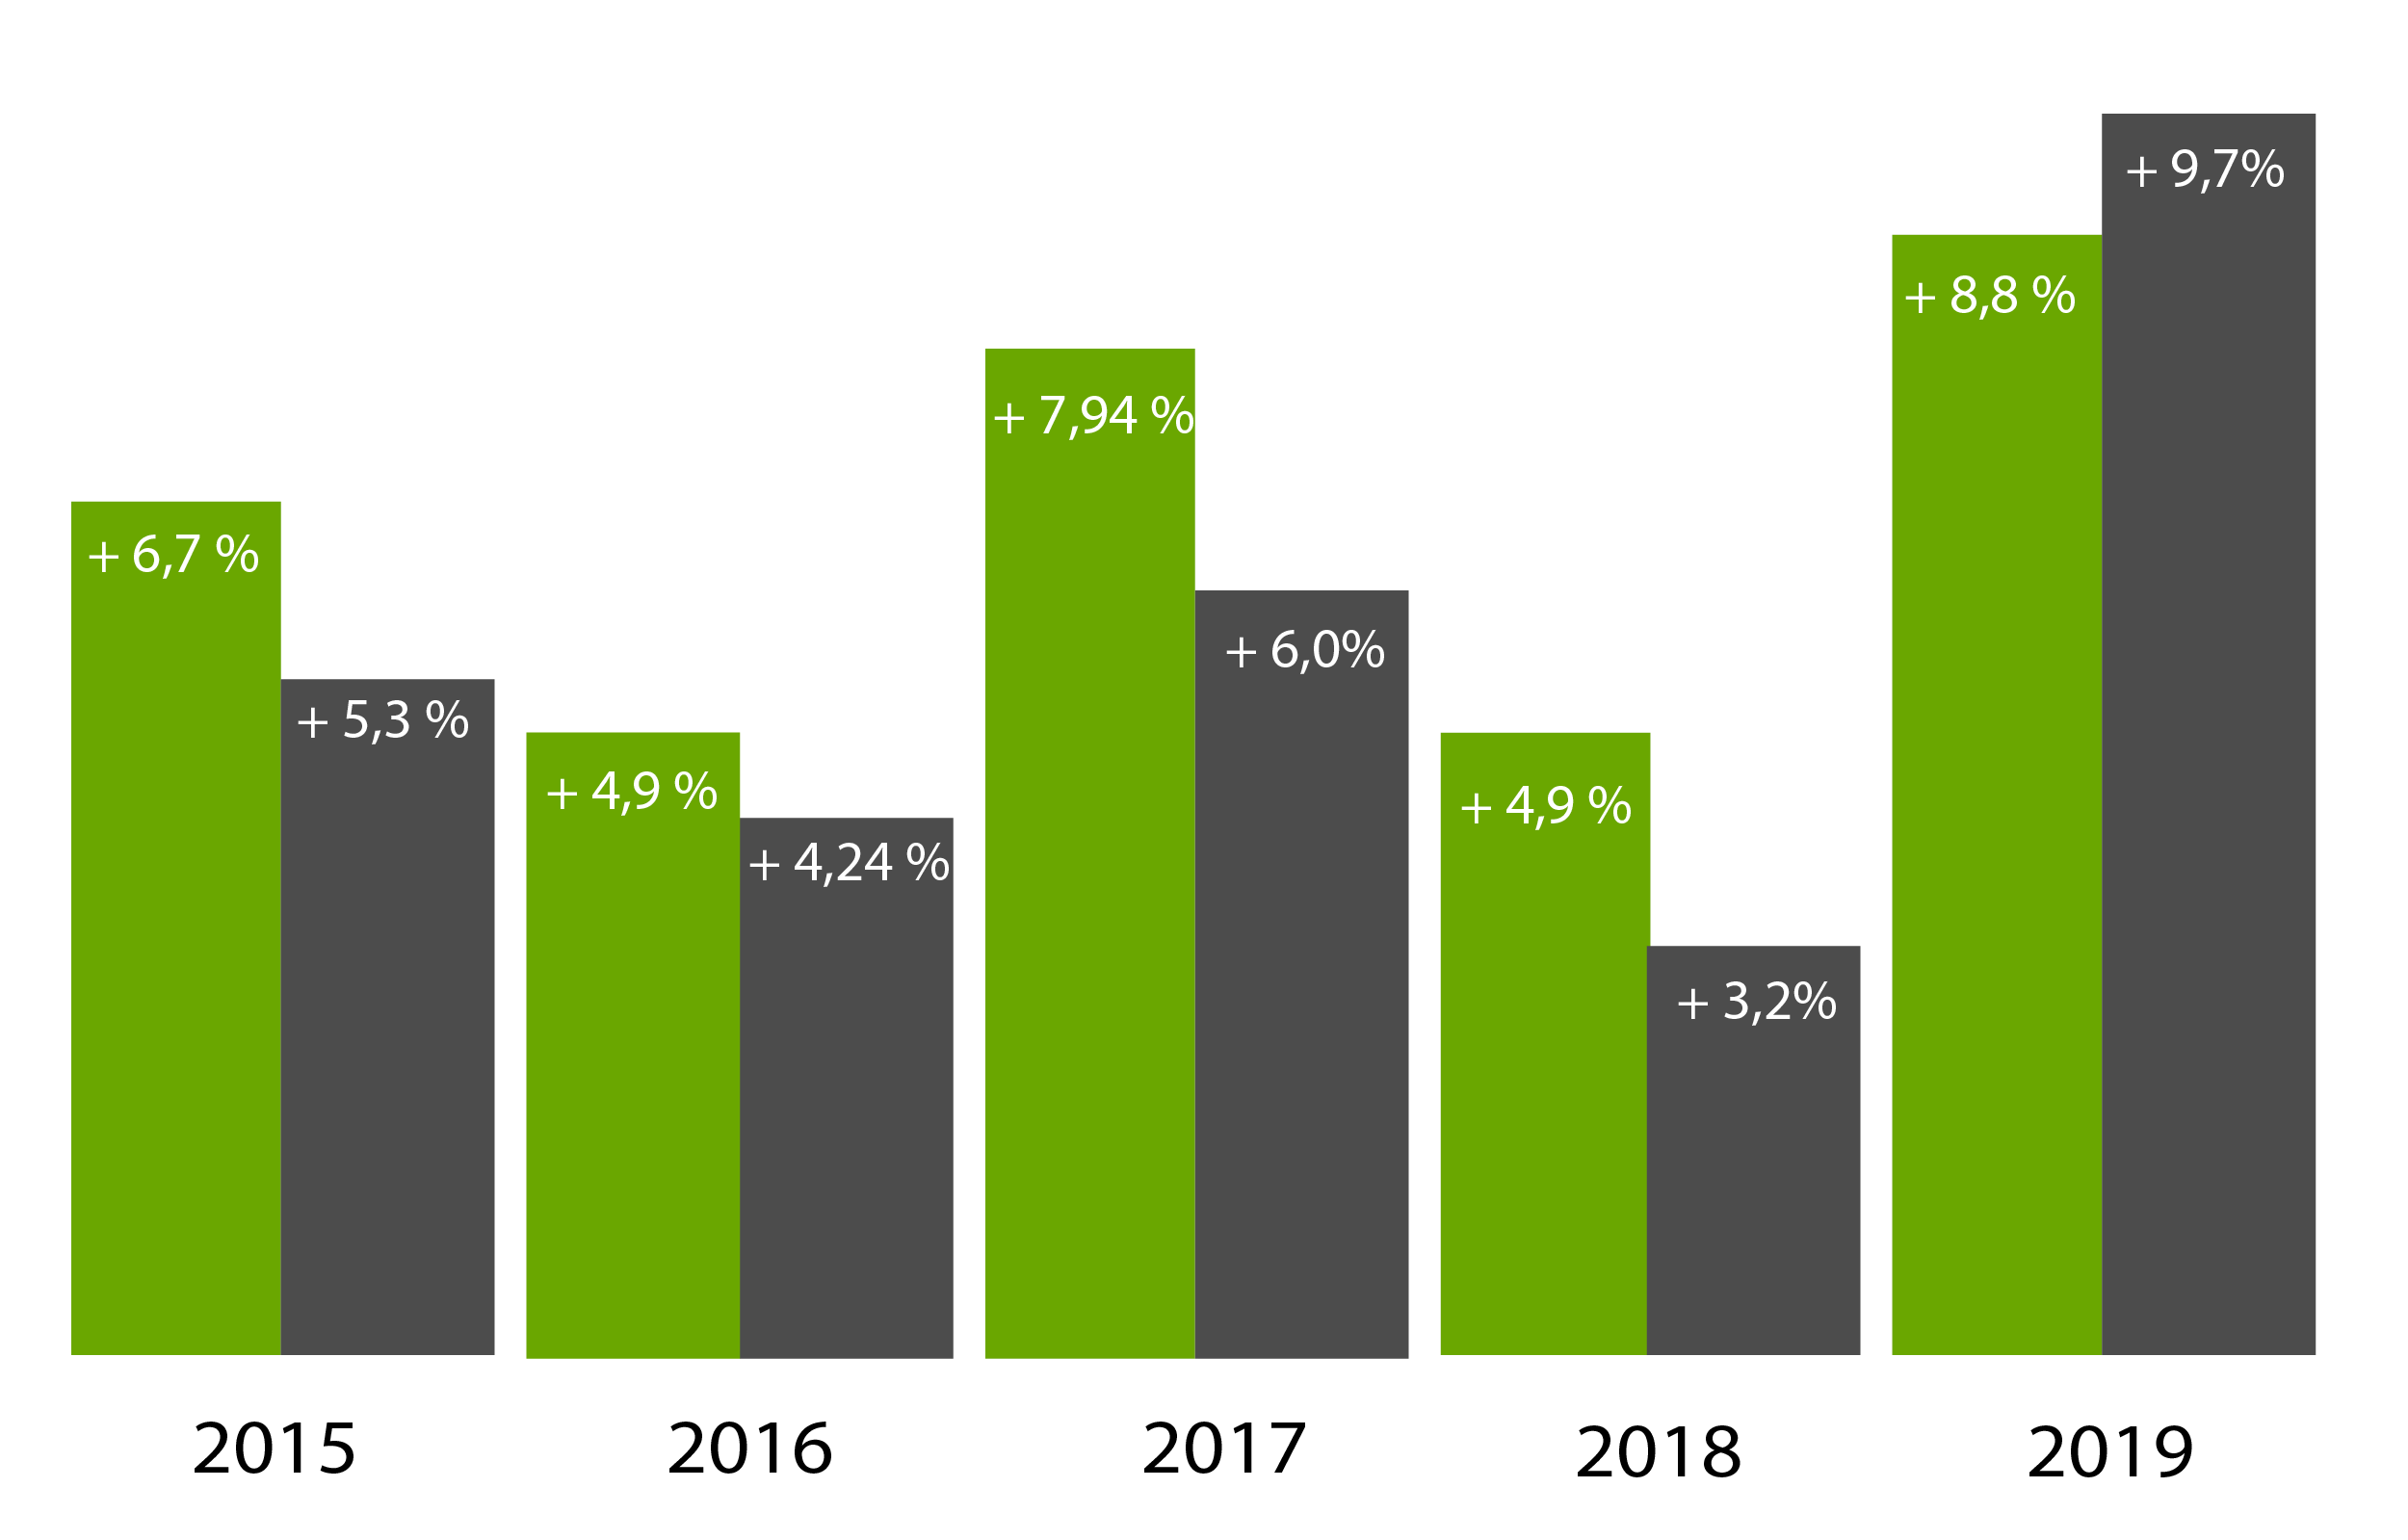 PR Agenturranking 2015 2019 Grafik 2020 gross